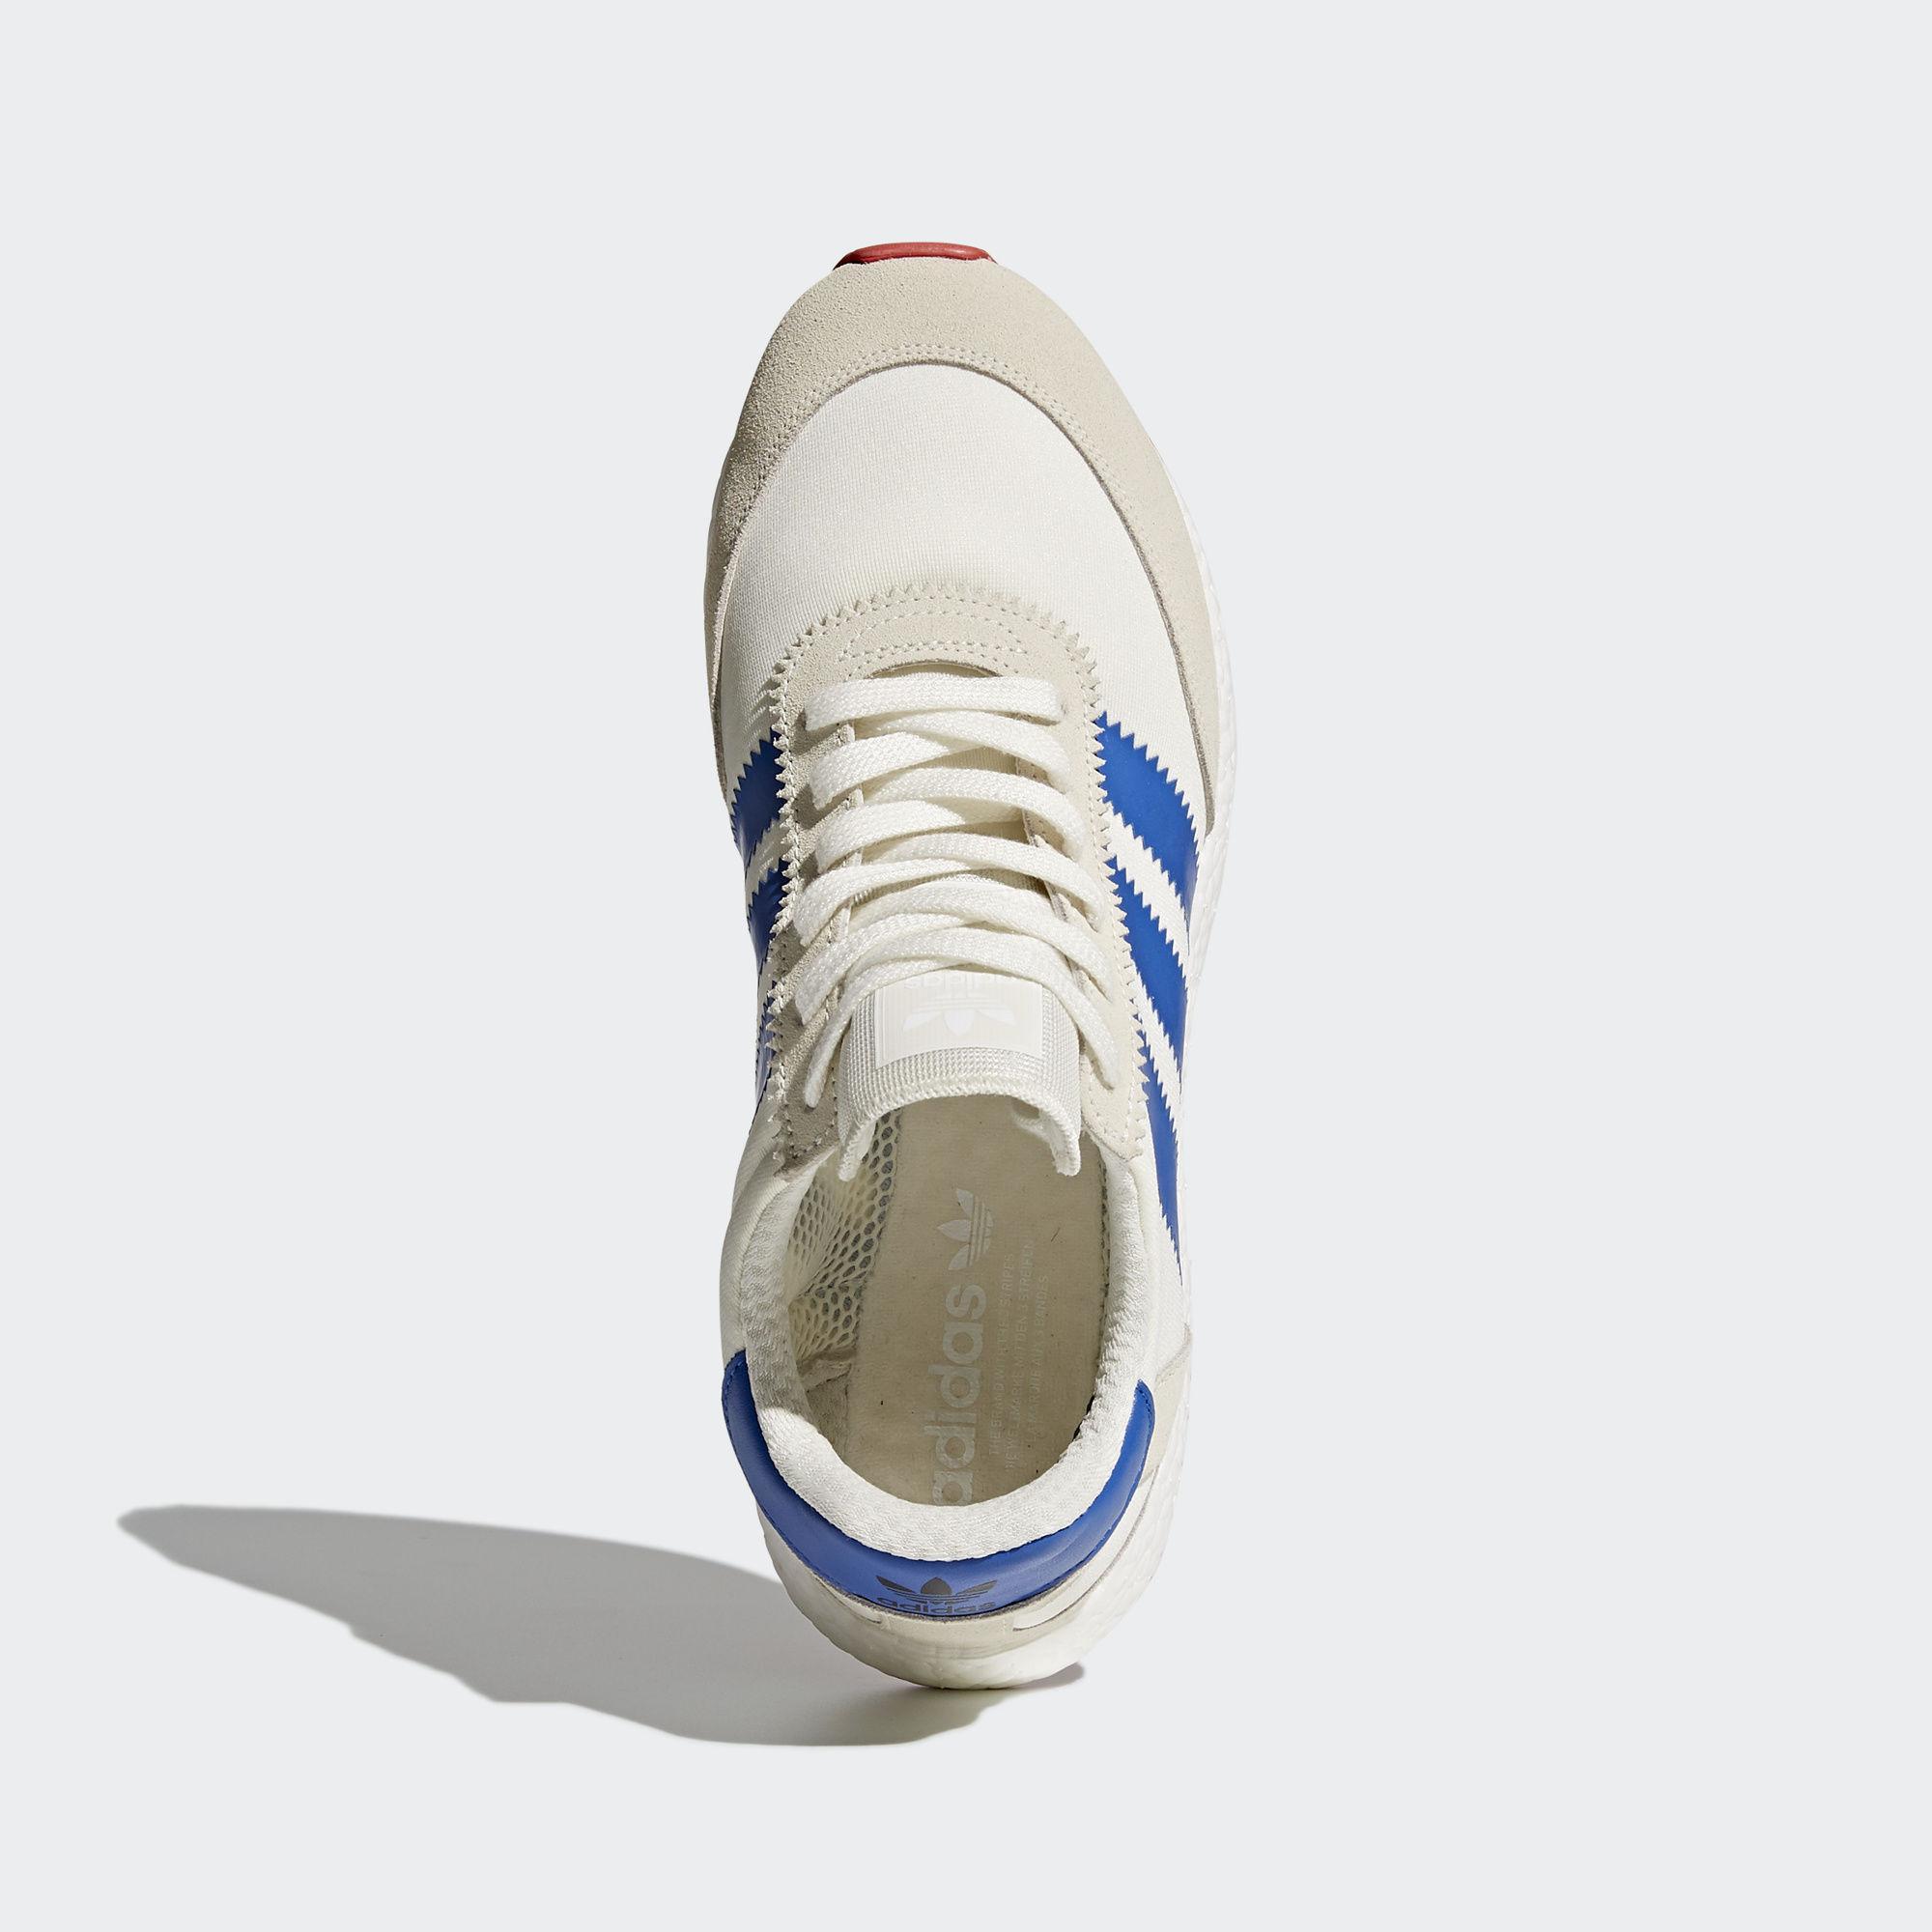 adfdc1d83a7797 Adidas - Blue I-5923 Shoes - Lyst. View fullscreen